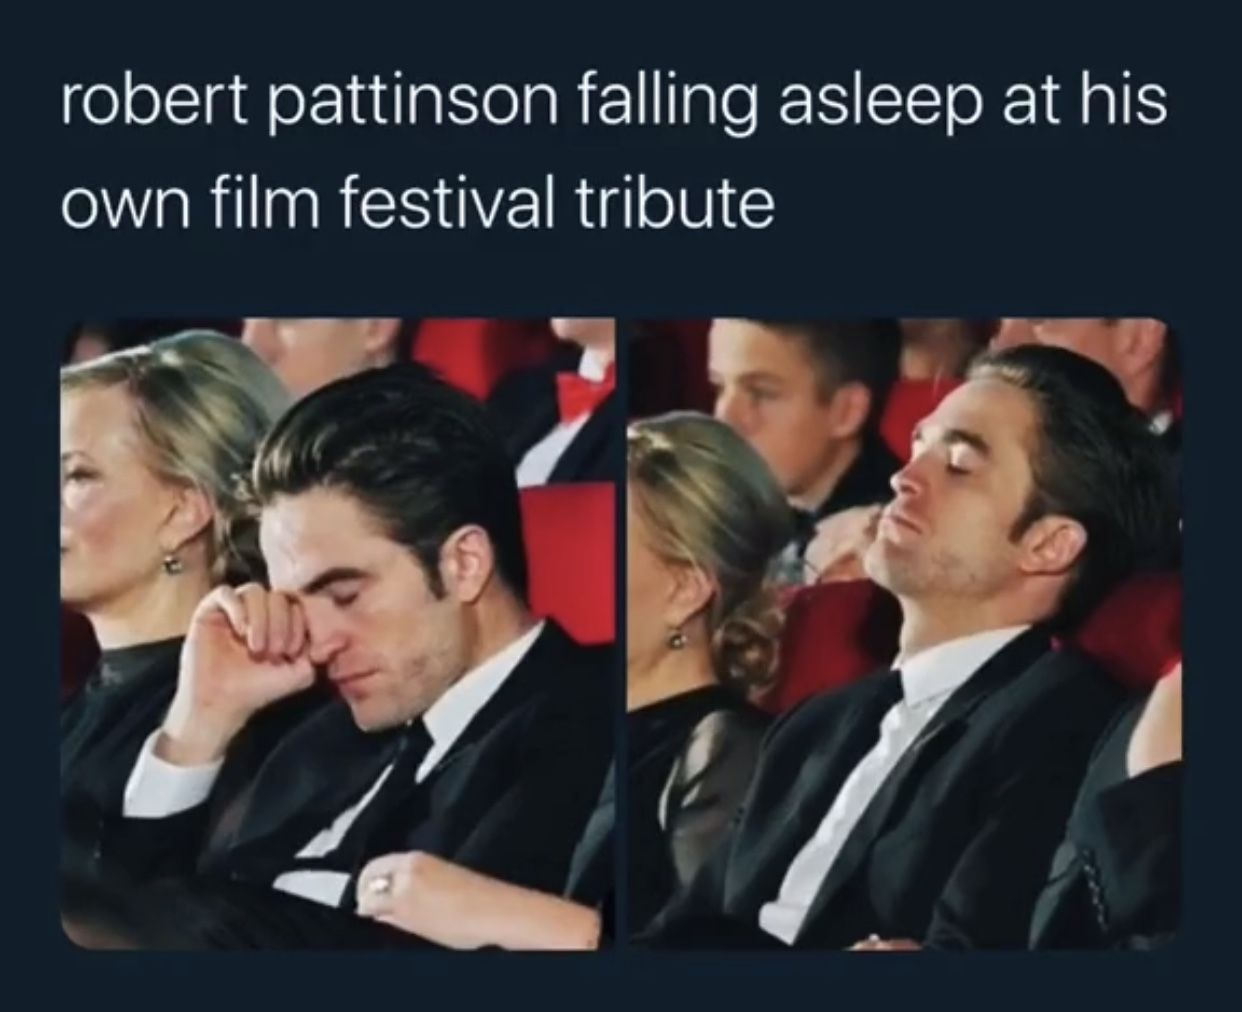 Pin By Slim Staysshady On Criminally Insane Robert Pattinson Really Funny Memes Funny Memes